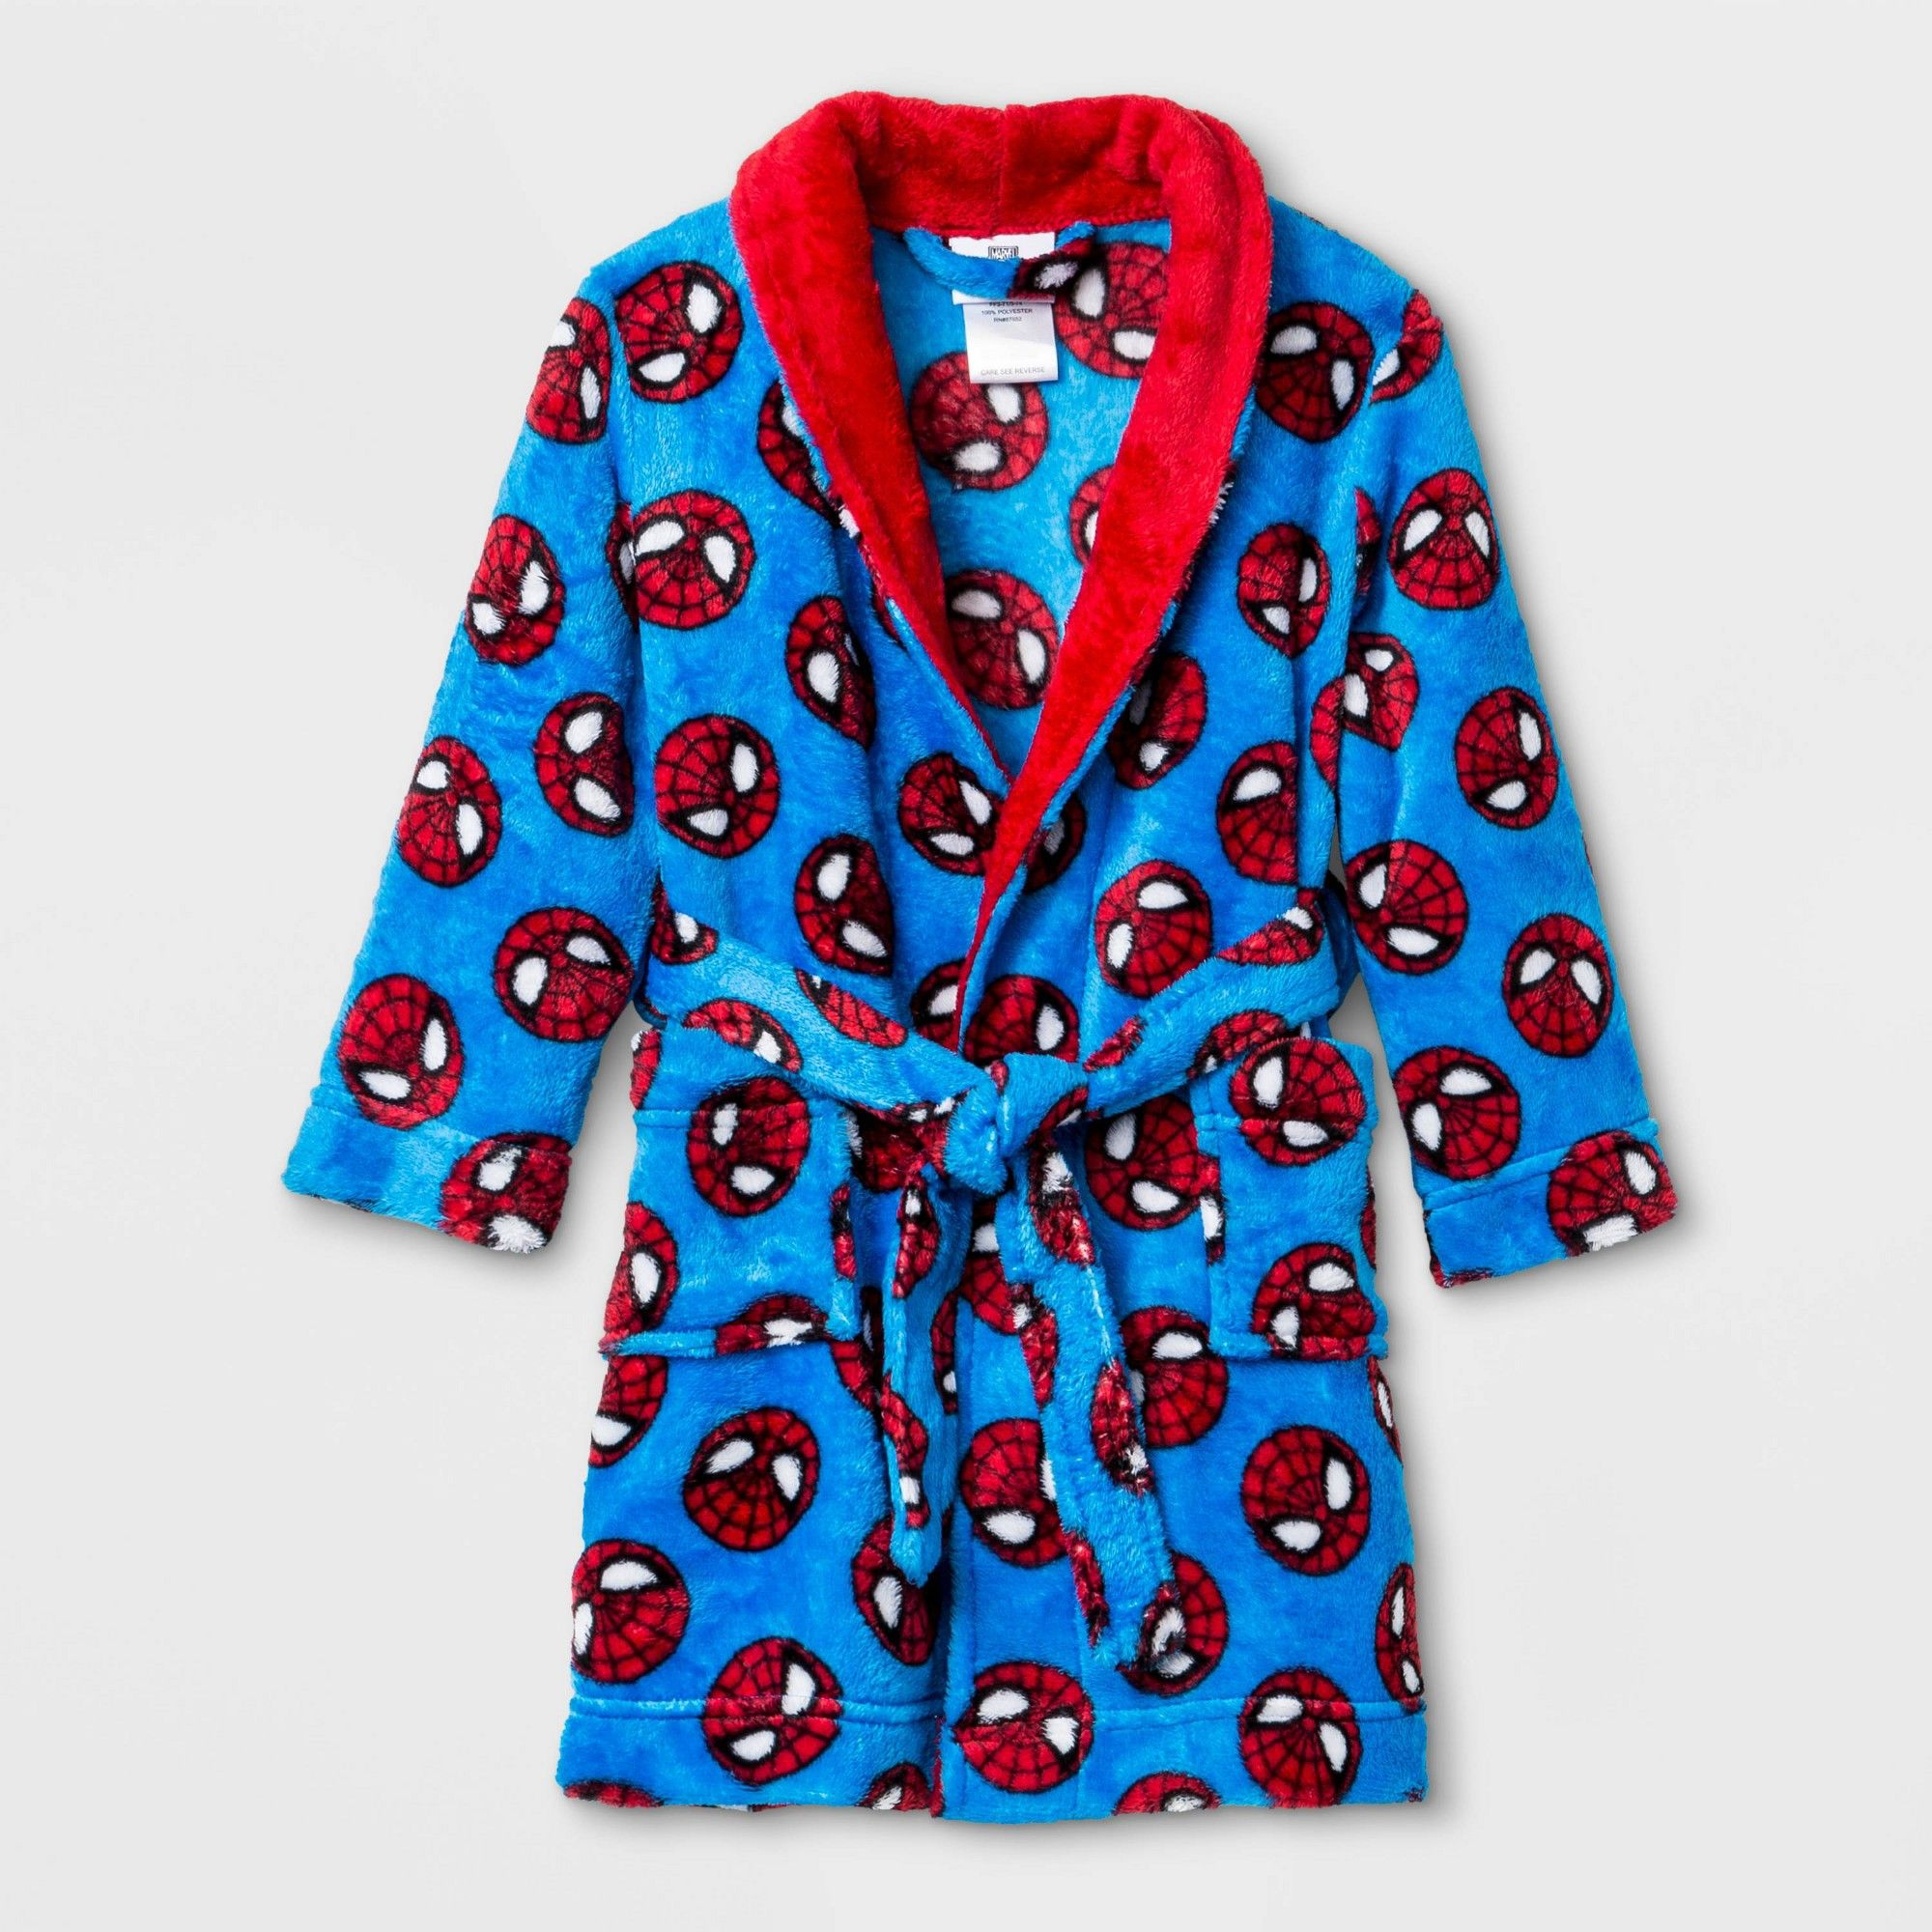 Marvel Spiderman Little Boys Coat Pajamas Set Blue